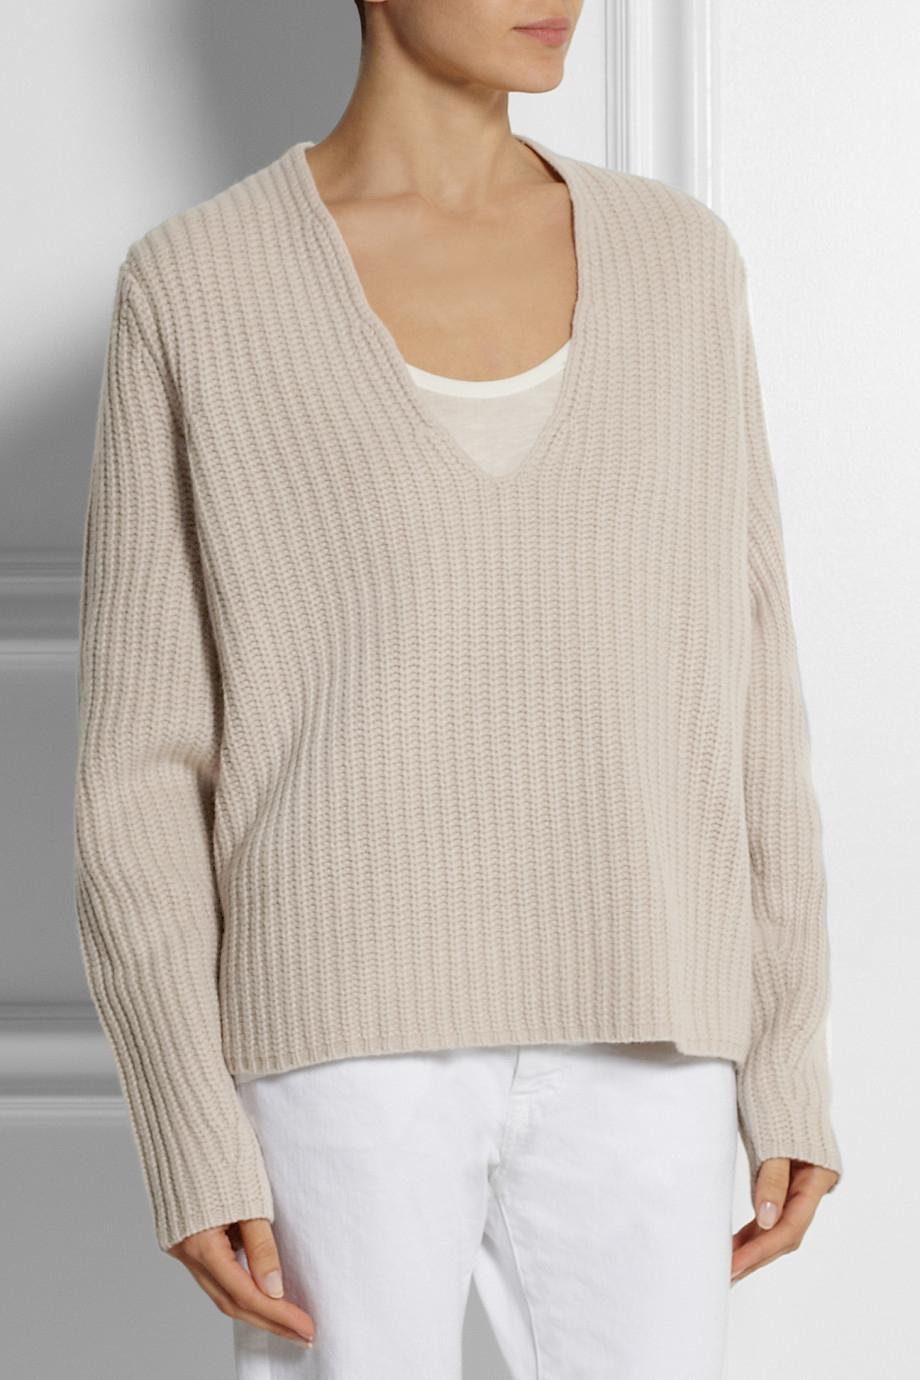 Acne studios Deborah Oversized Ribbed Wool Sweater in White | Lyst